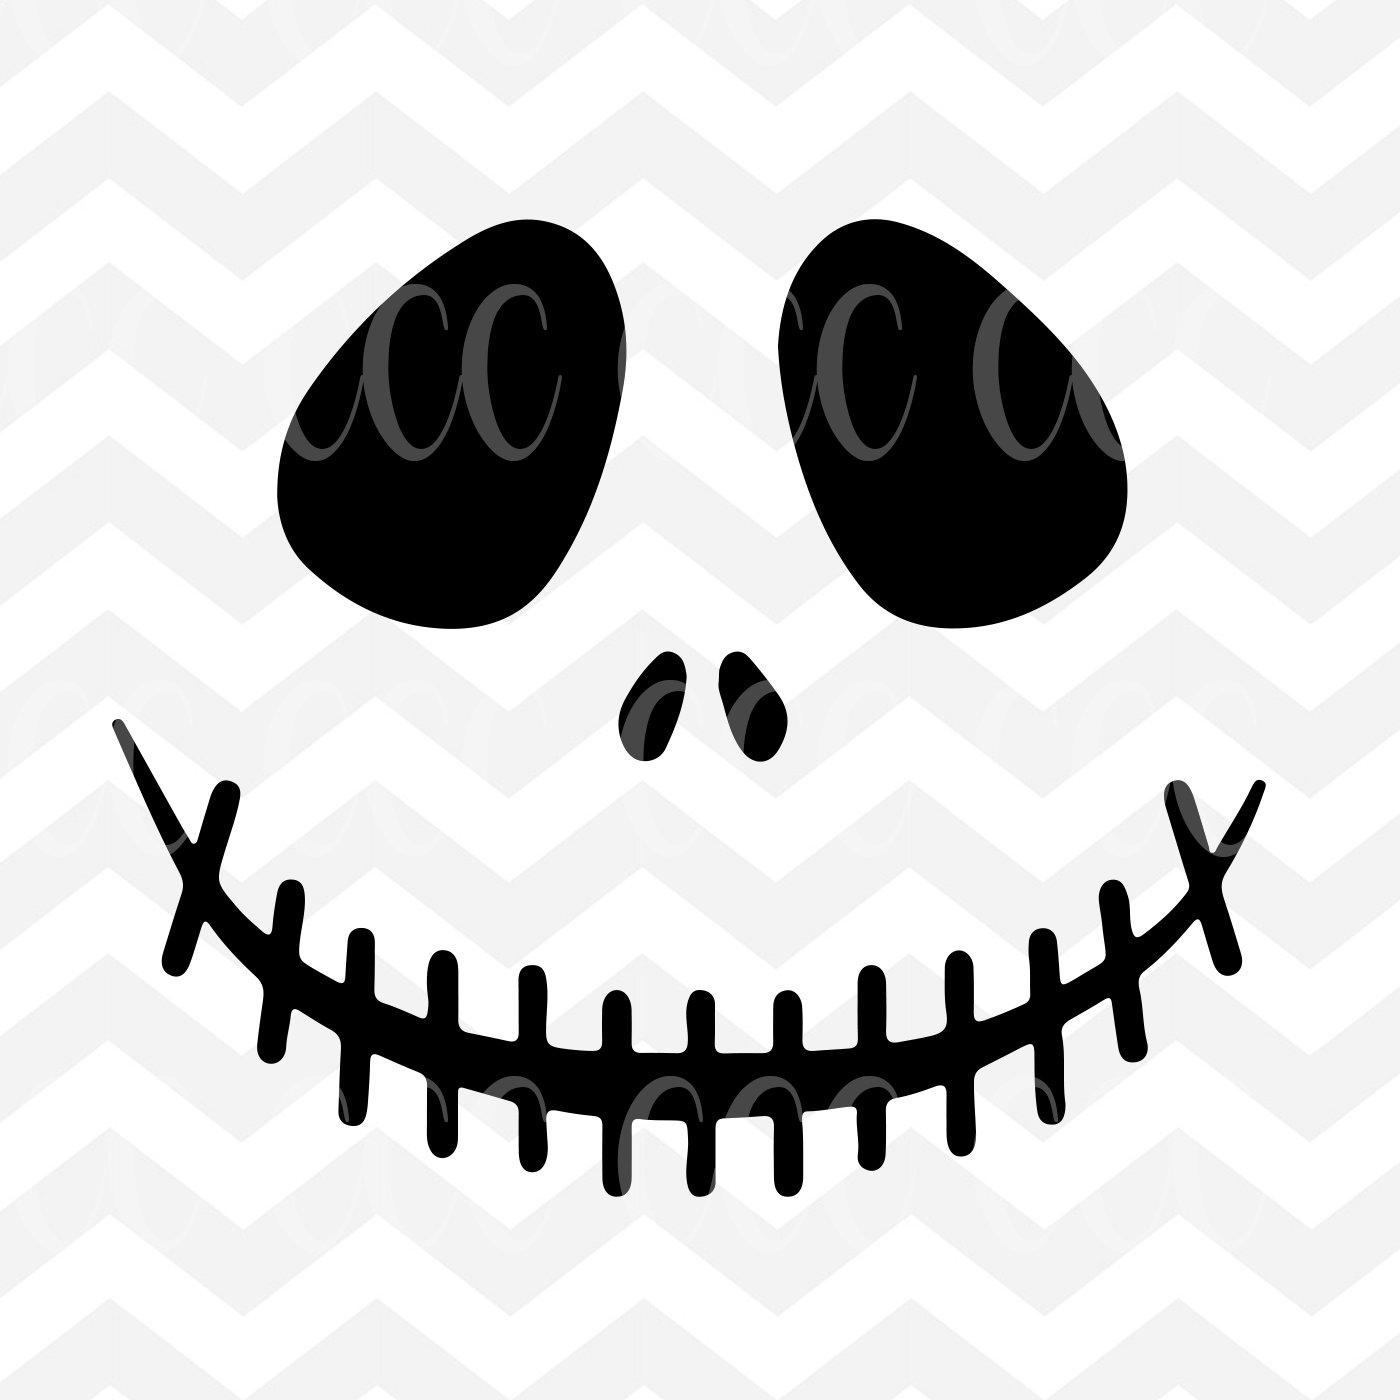 Jack Skellington Face The Nightmare Before Christmas SVG ...  The Nightmare Before Christmas Jack Makeup